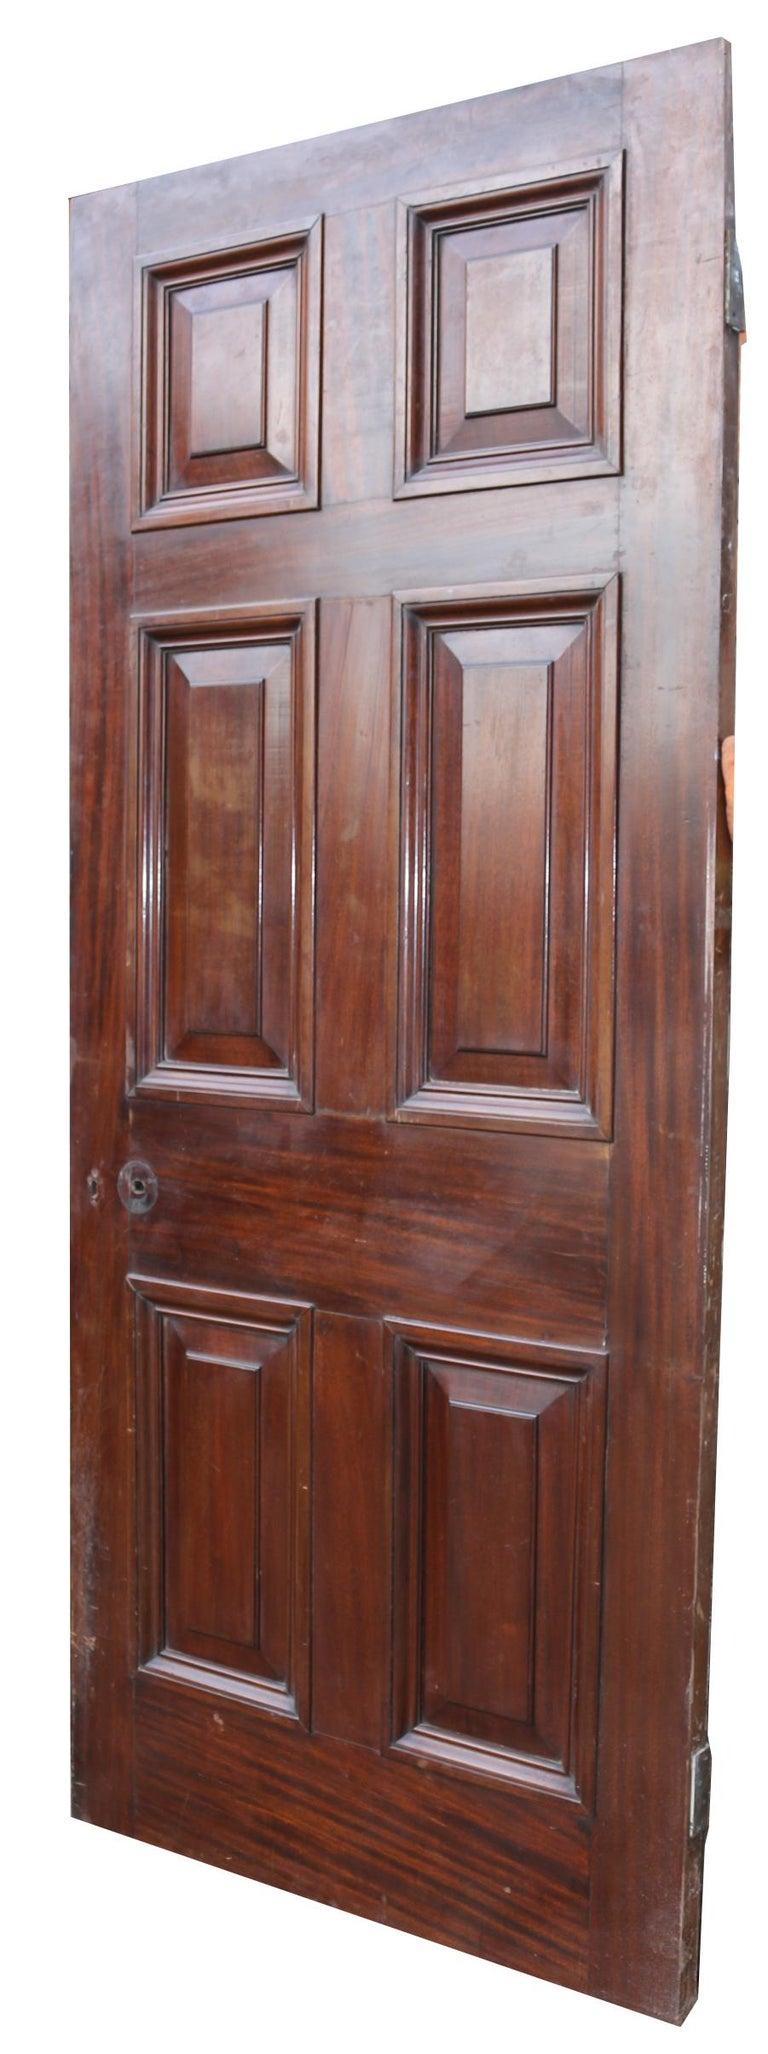 19th Century Antique Mahogany Six Panel Door For Sale